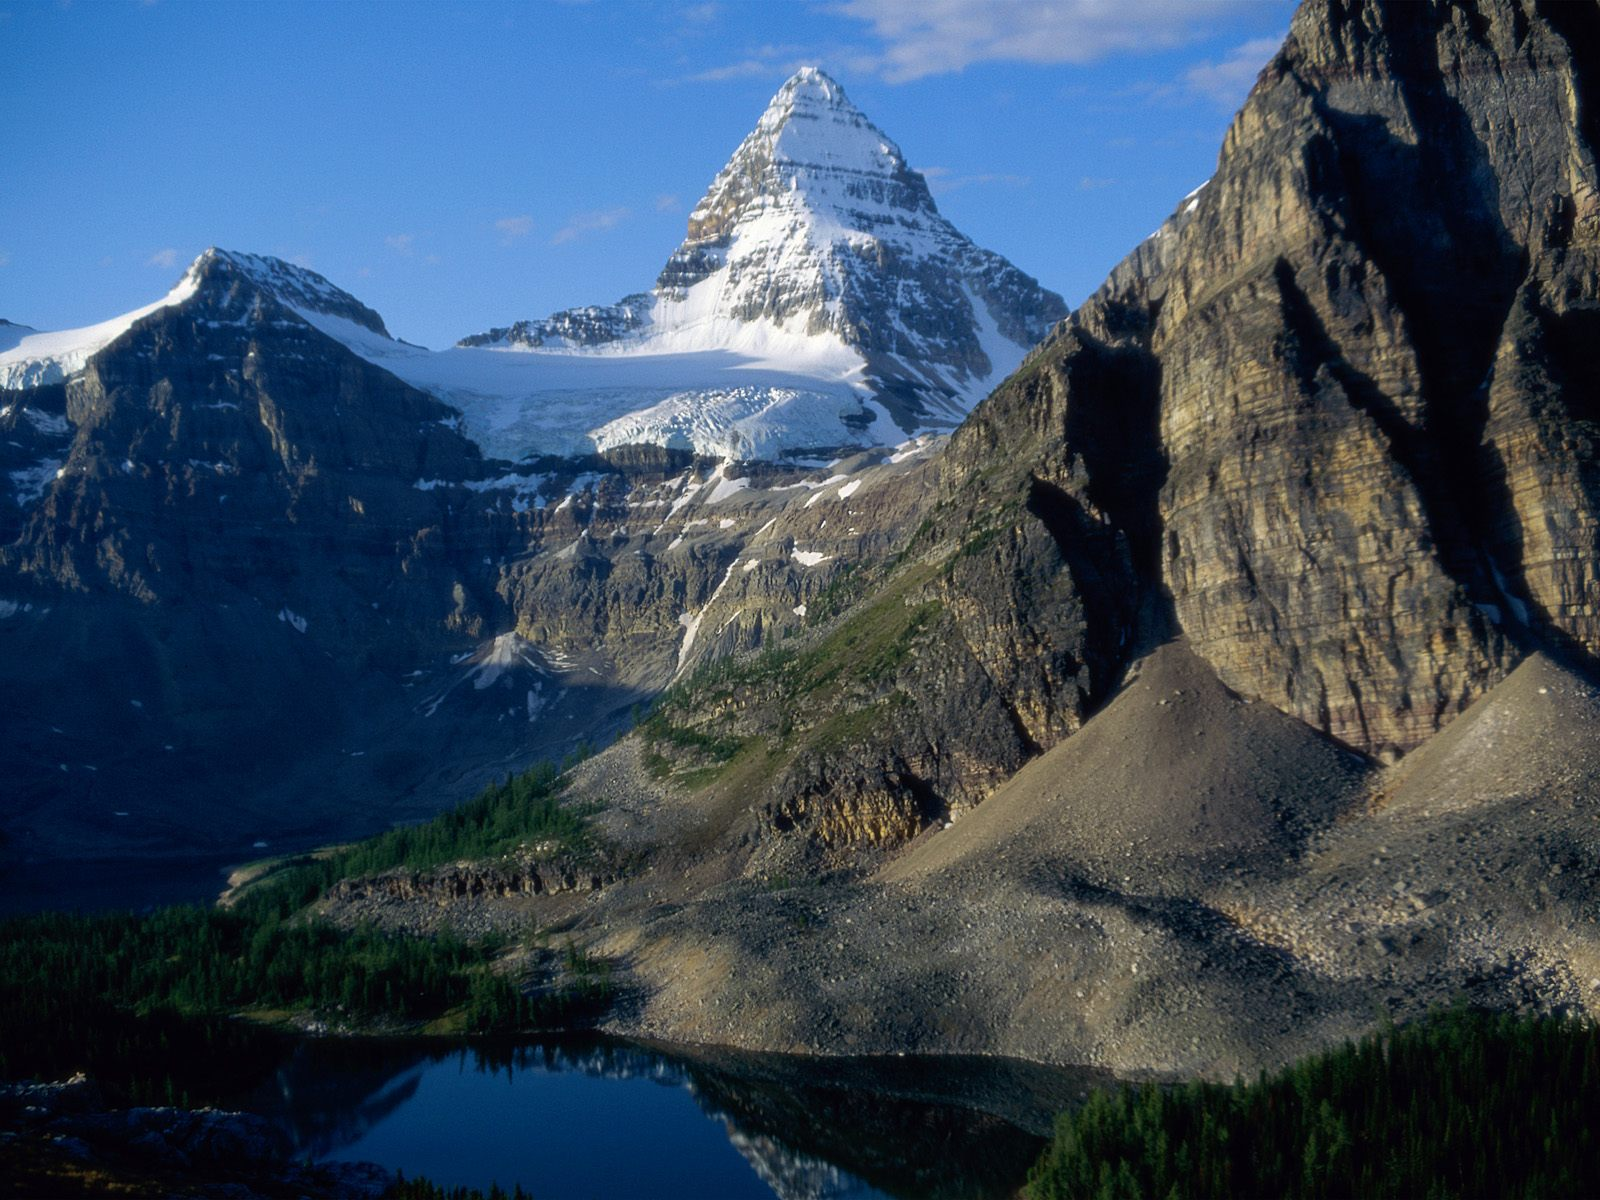 Download Rocky Mountains wallpaper rocky snow mountain 1600x1200